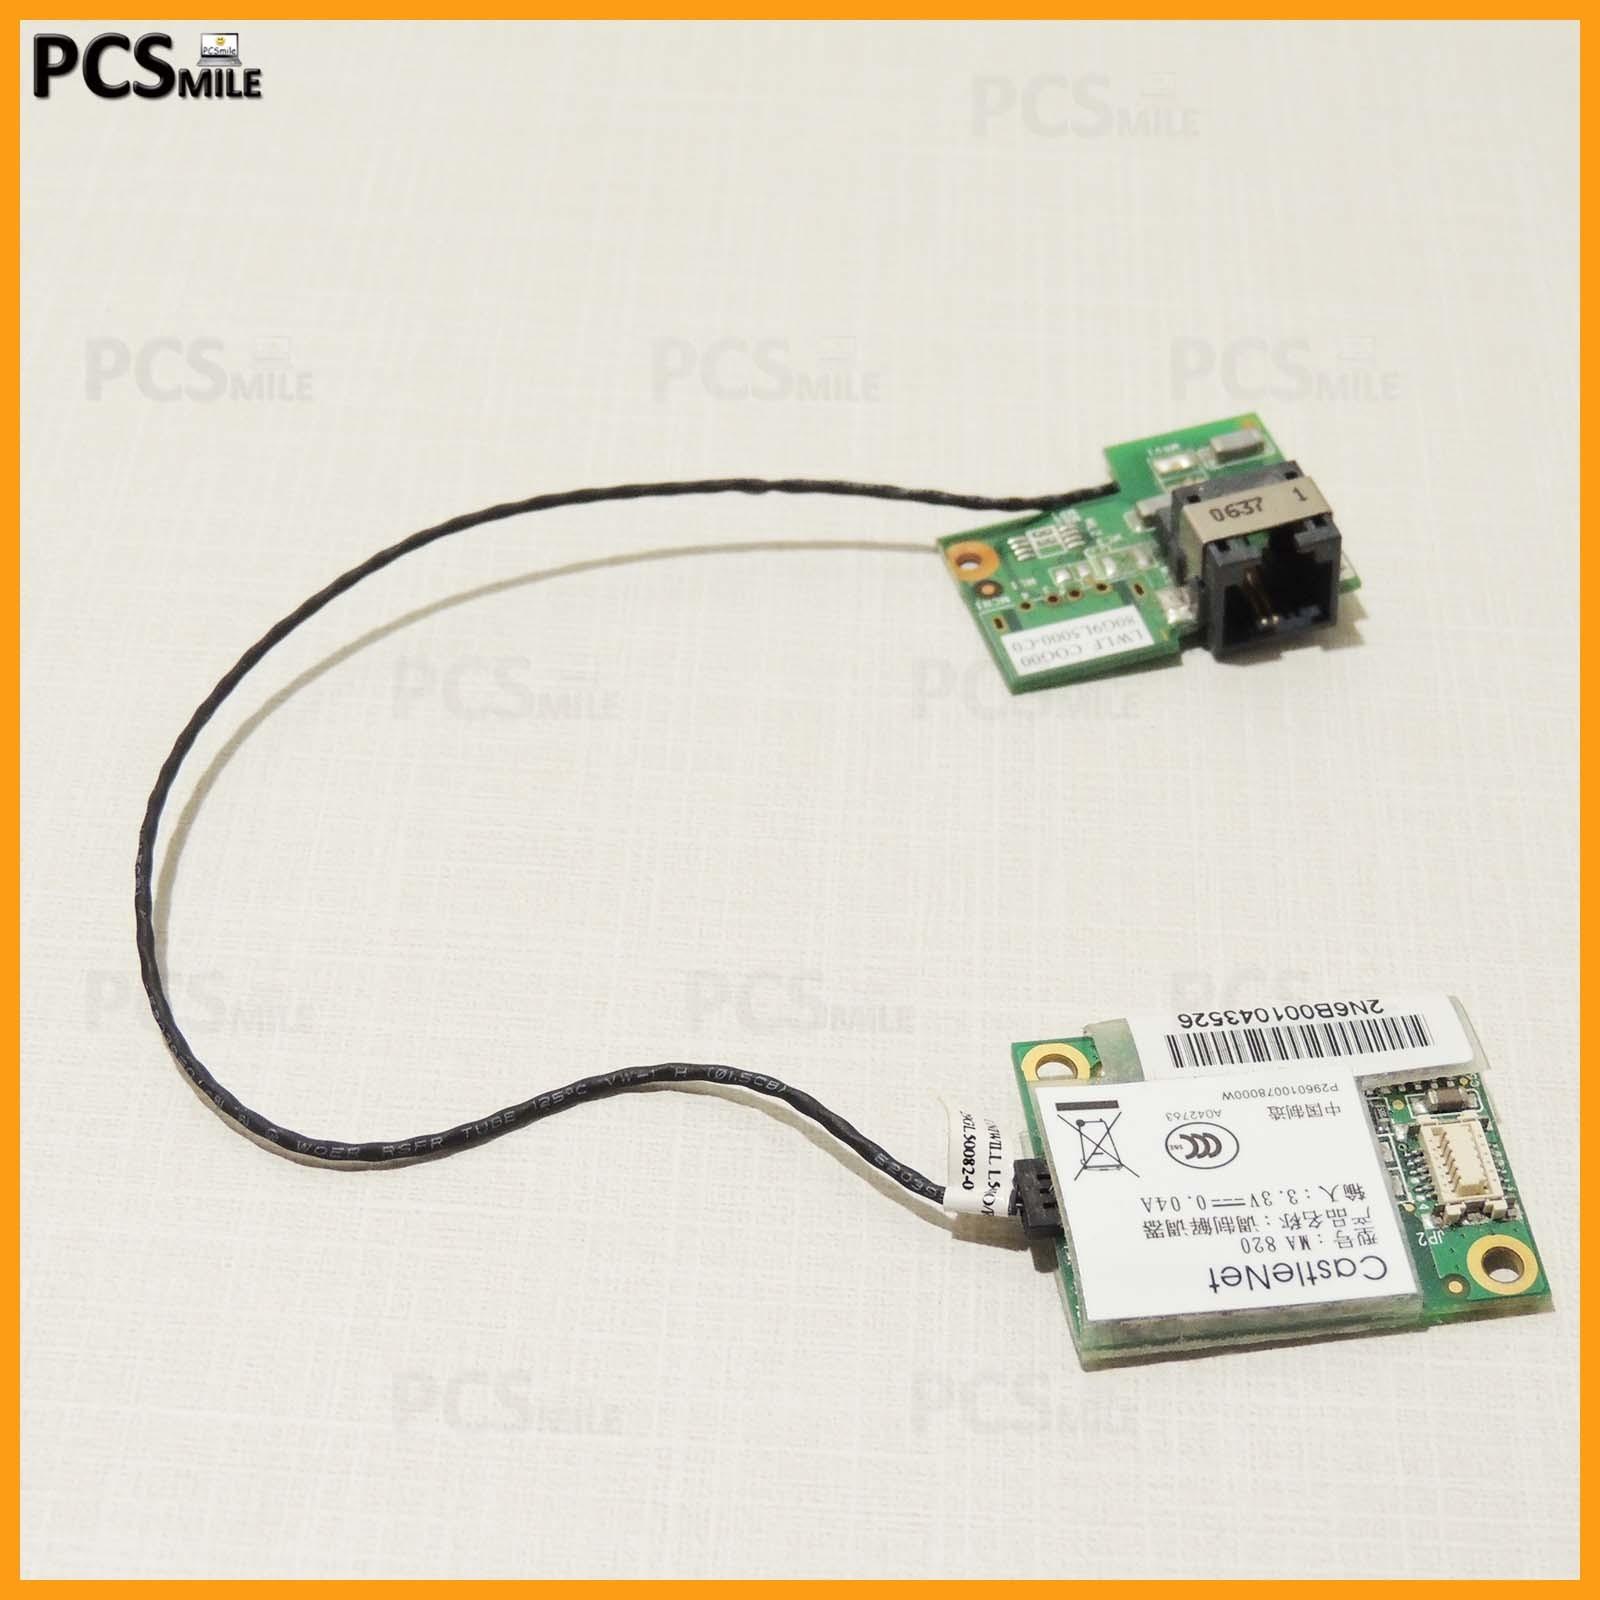 Modem Castlenet 76G060820-00 Amilo Pi 1505 BS032 Fujitsu Siemens